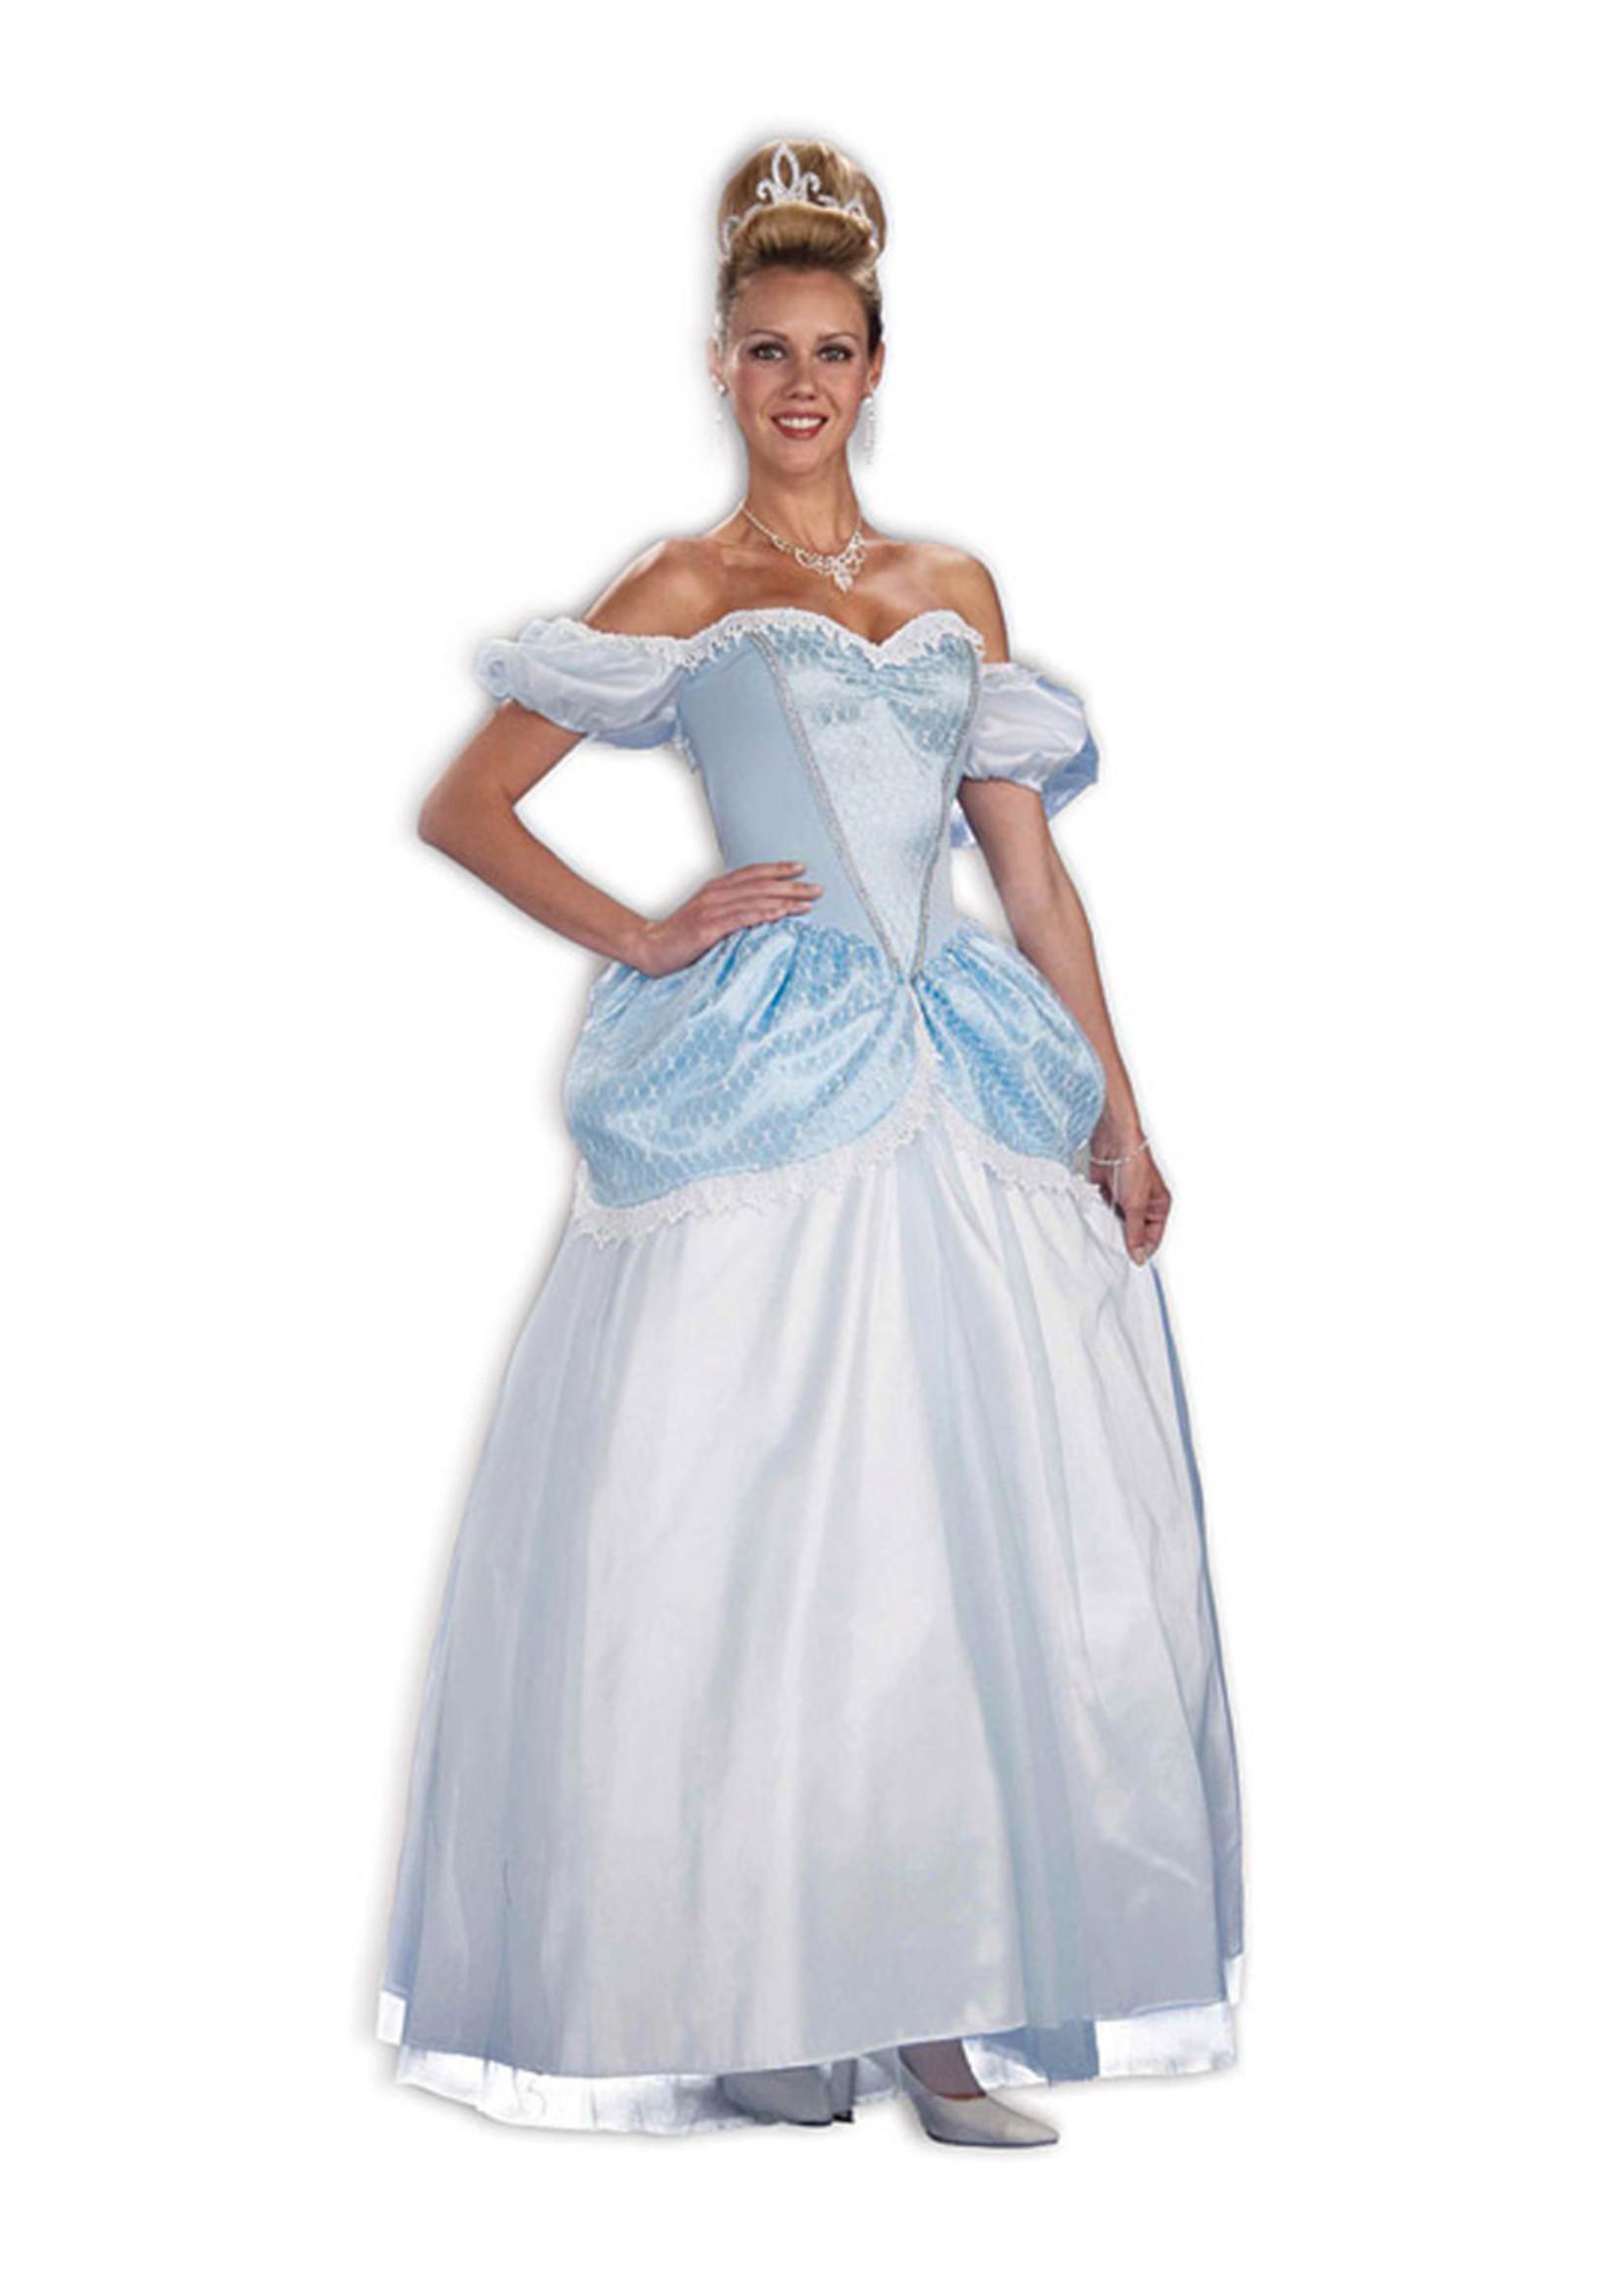 Storybook Princess Costume - Women's